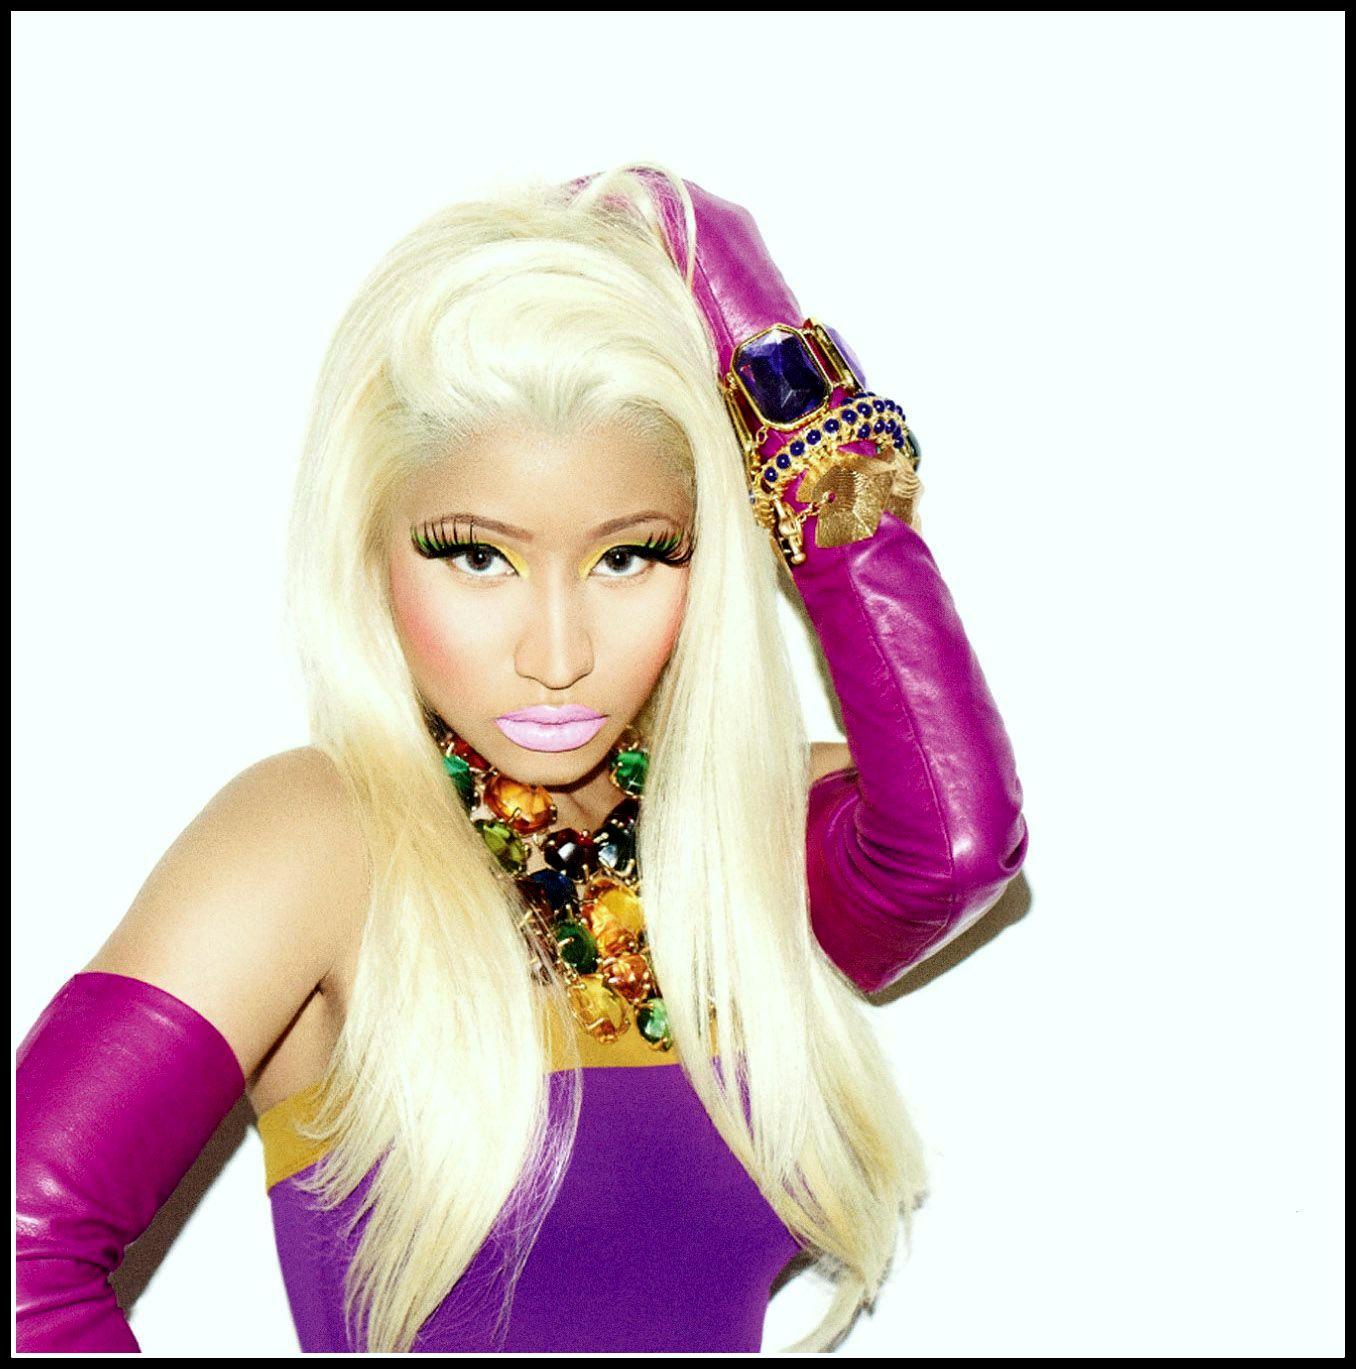 http://4.bp.blogspot.com/-TRbAxQczJZY/UHm6XP8joyI/AAAAAAAACxU/FYnNr8zg9pQ/s1600/Nicki-Minaj-Starships.jpg